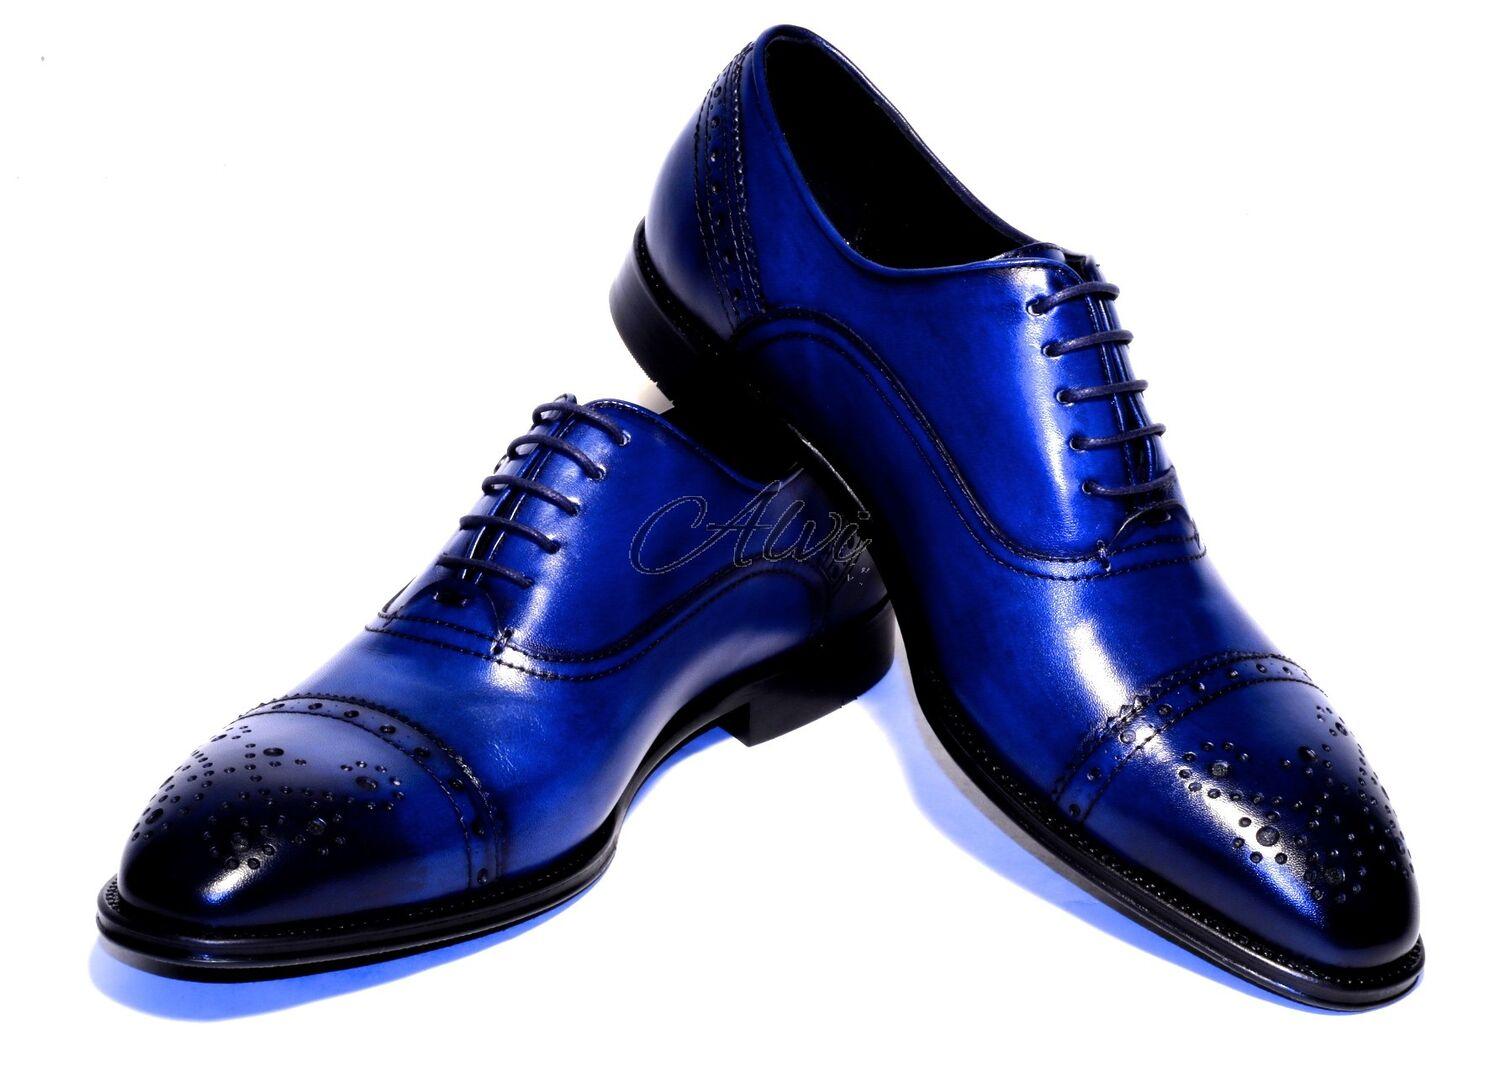 competitive price b8c4f 8d24b scarpe uomo eleganti blu